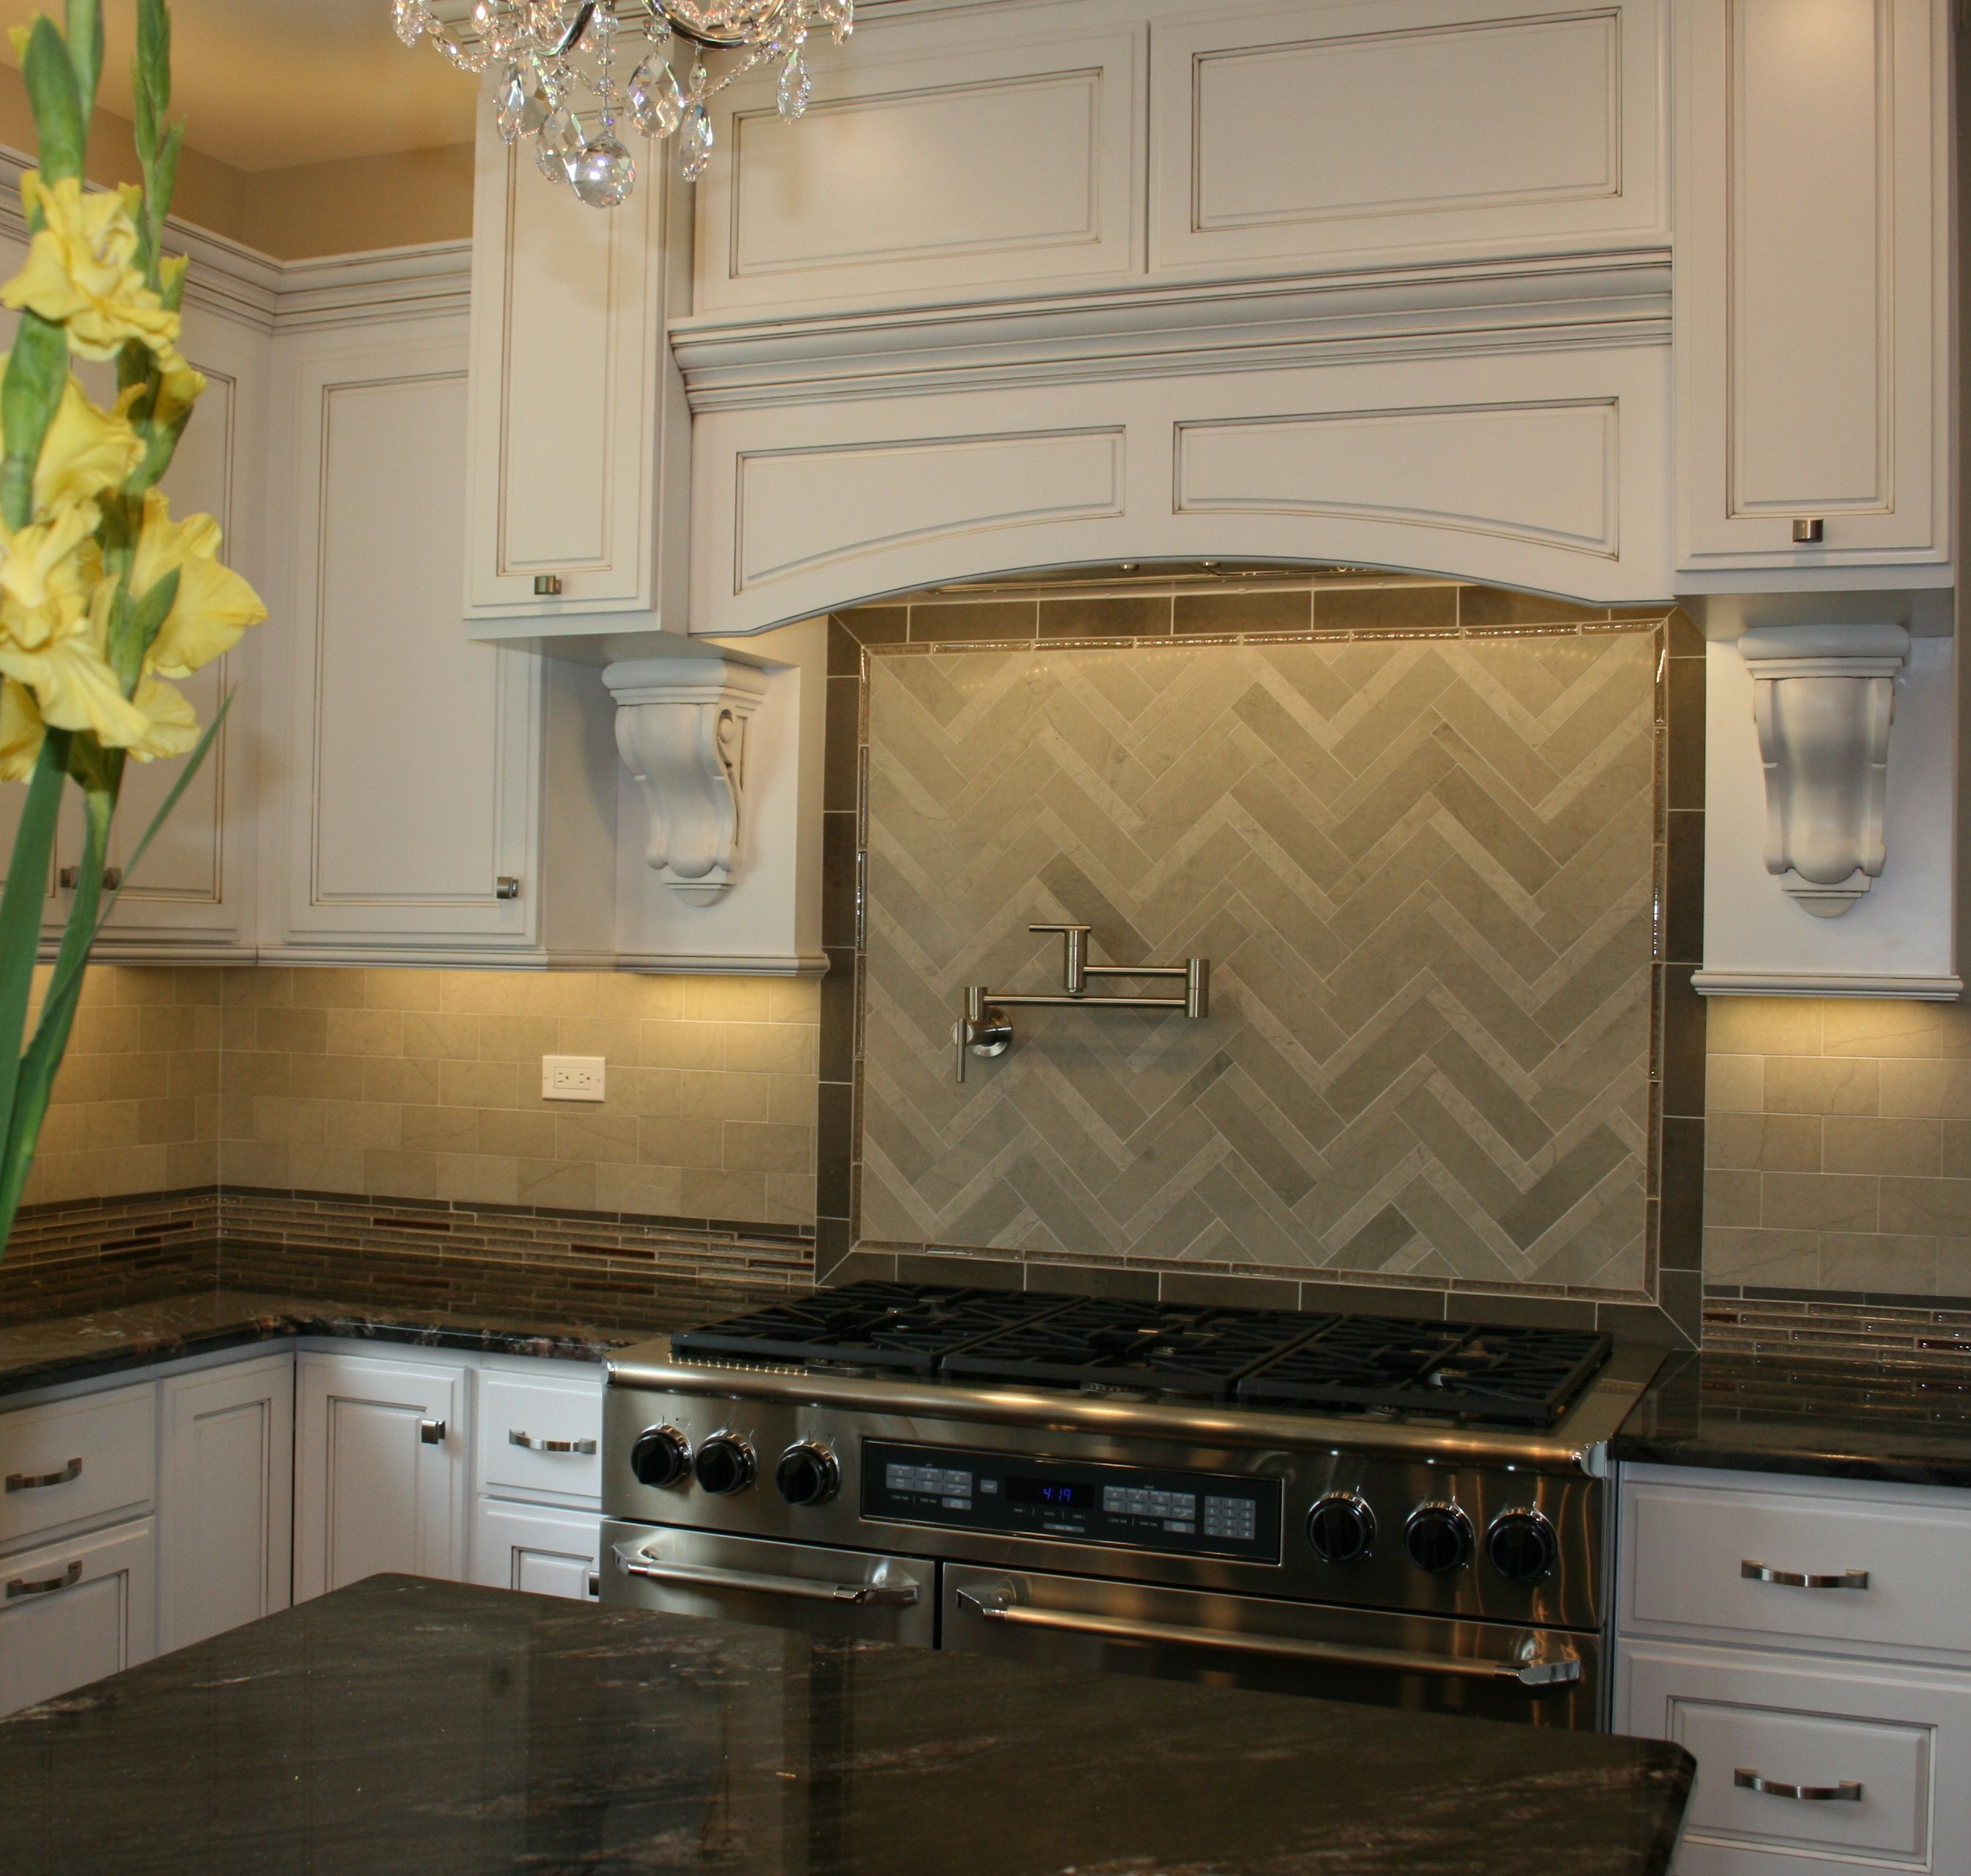 Kitchen Backsplash Neutral: Pin By Great Western Flooring On Great Backsplashes In